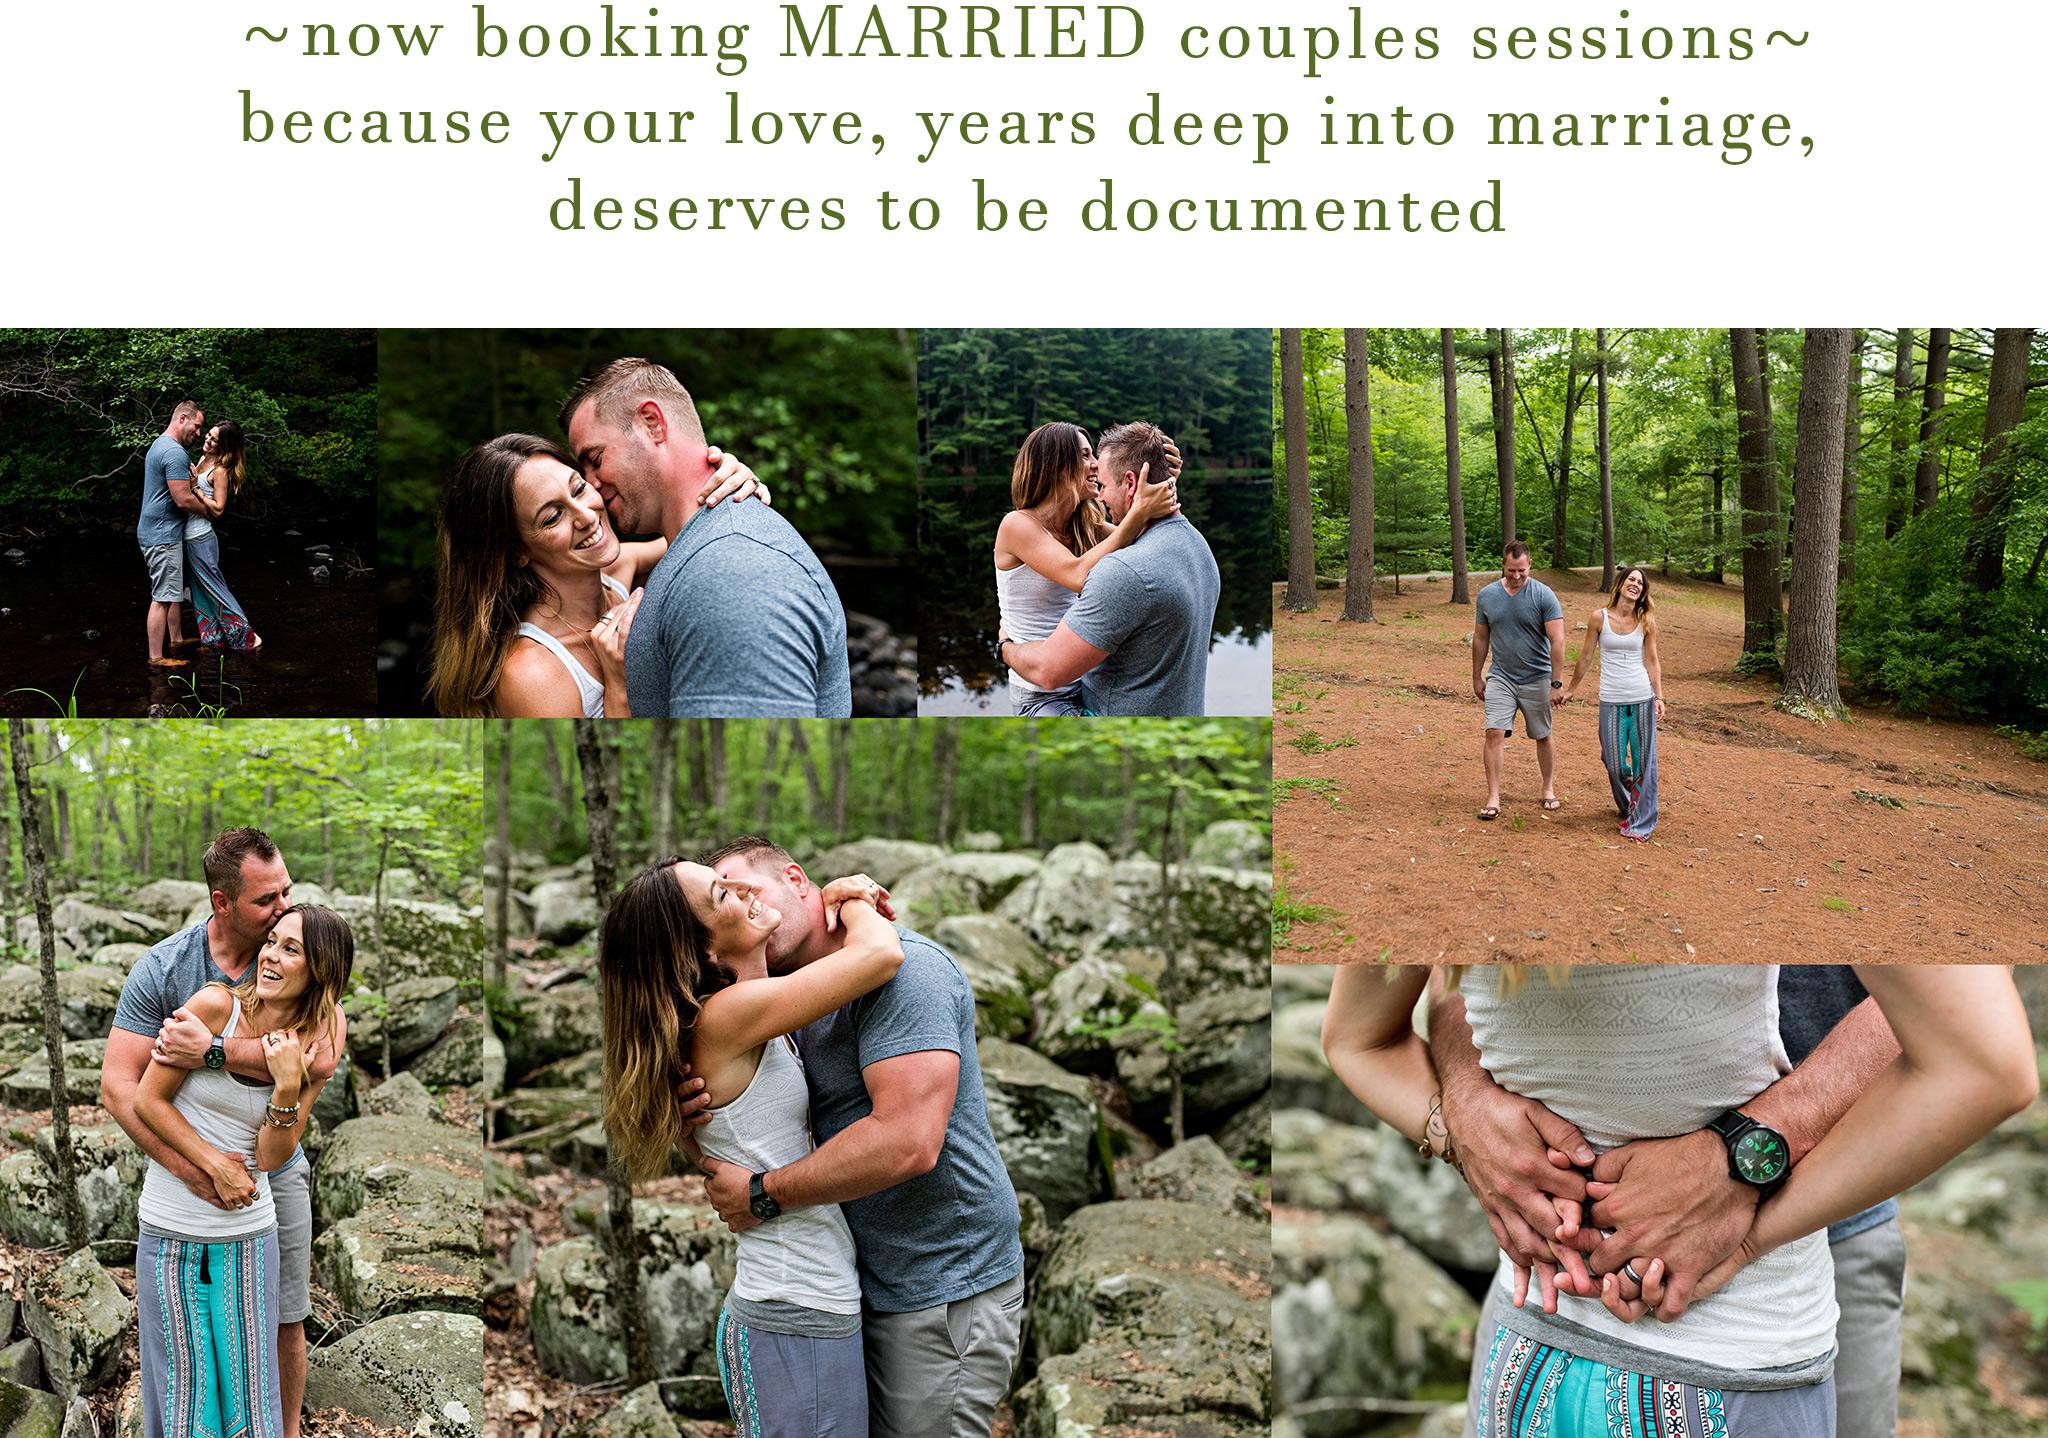 connecitcut couples photography, ct engagement photography, ct anniversary photography, ct wedding photography, connecitcut wedding photography